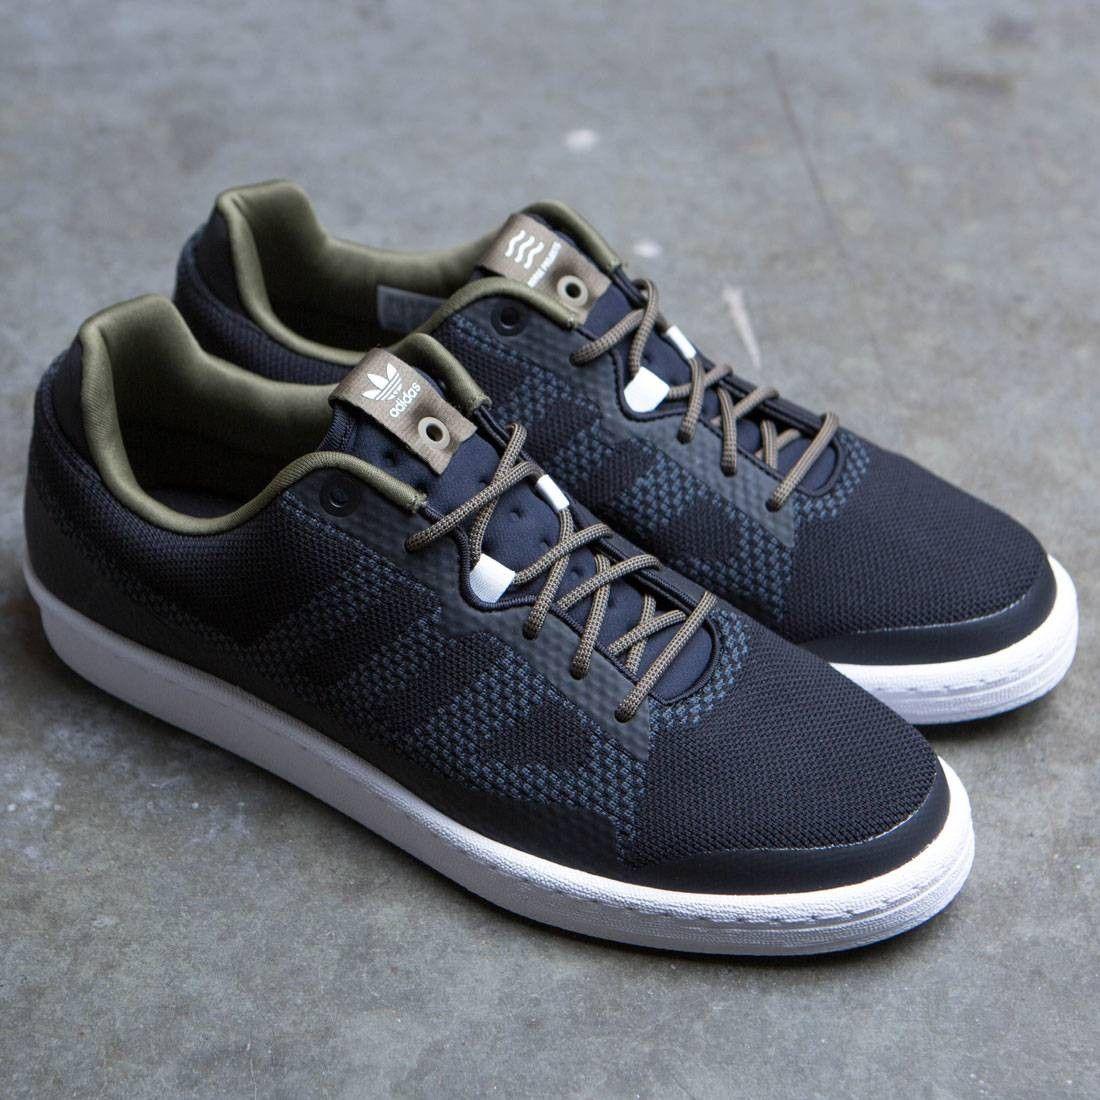 Adidas Consortium x Norse Projects Men Campus 80s PK gray dark ...